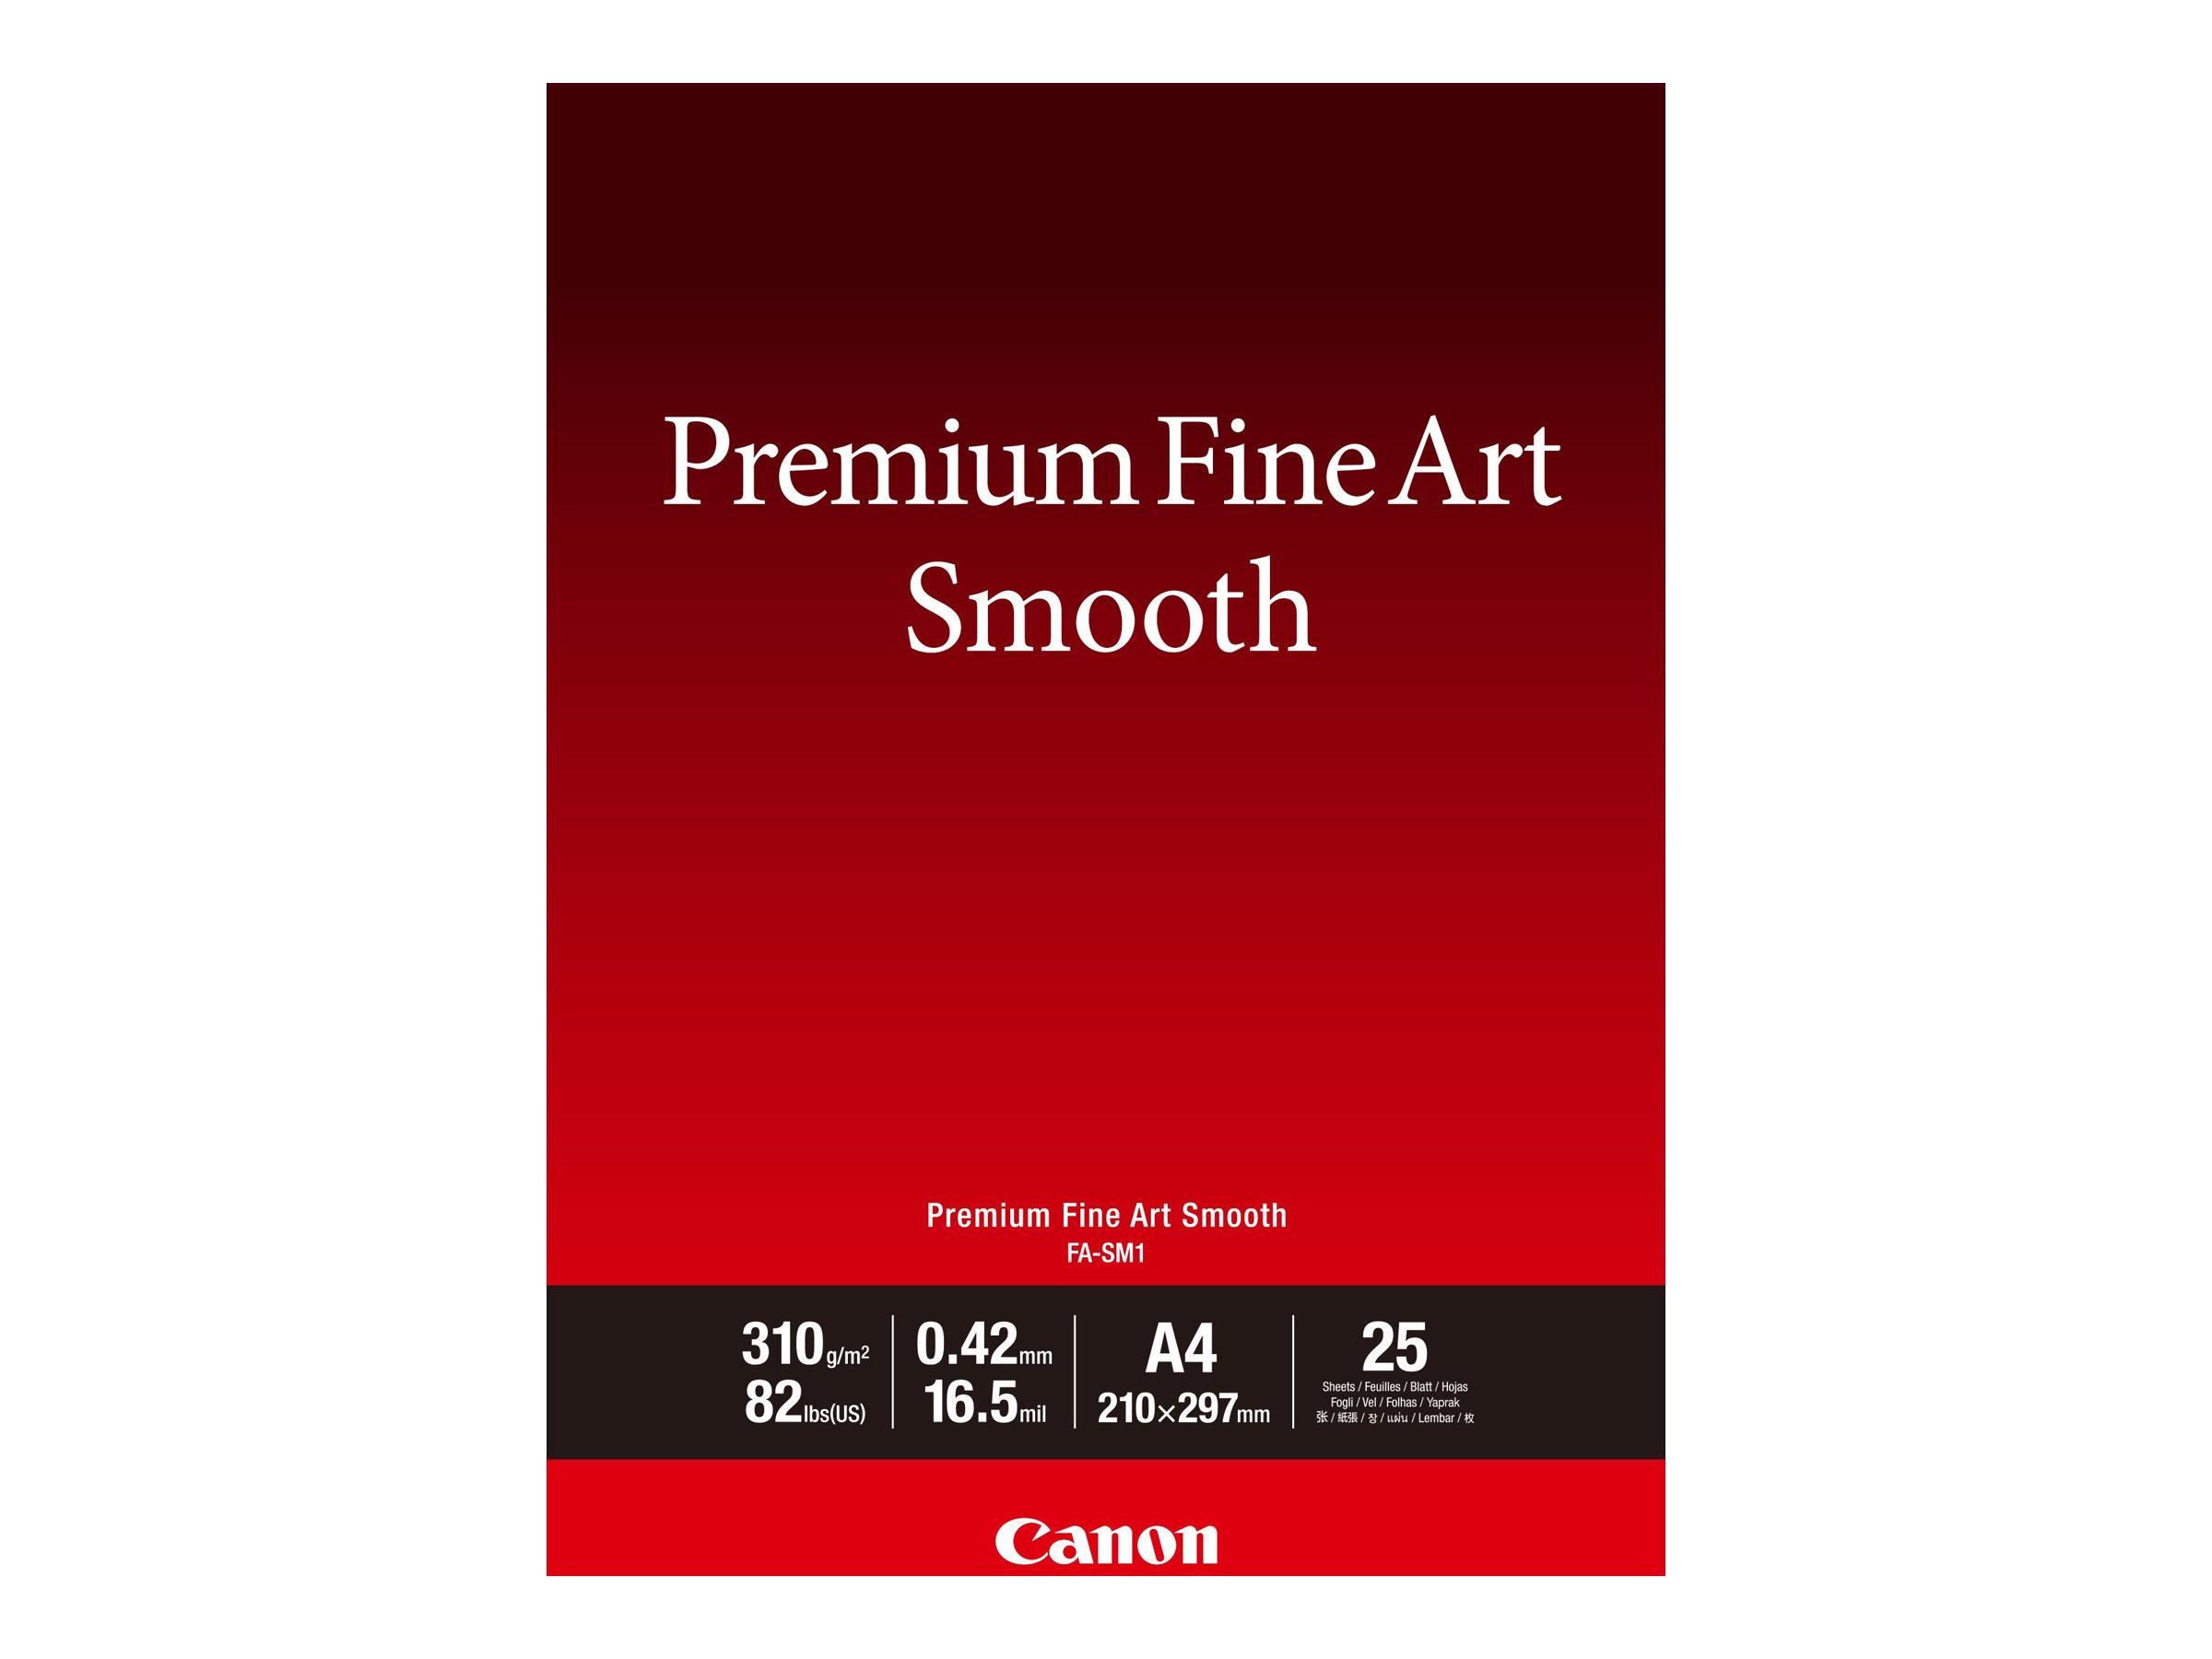 Canon Premium Fine Art Smooth FA-SM1 - Seidig - 16,5 mil - A4 (210 x 297 mm) - 310 g/m² - 25 Blatt Fotopapier